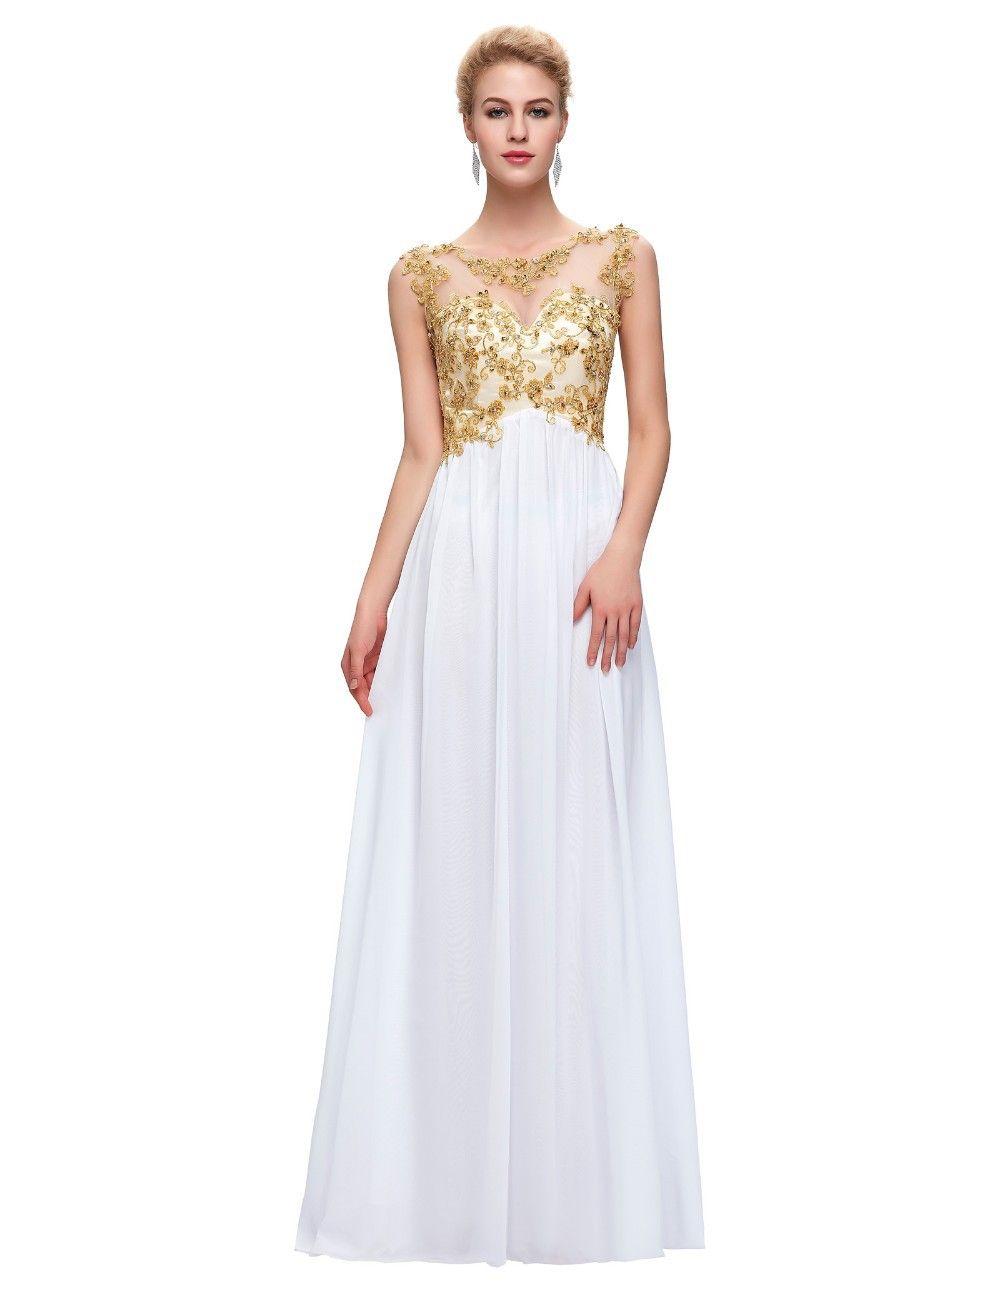 Prom dressesevening dressesgraduation party dresses on luulla